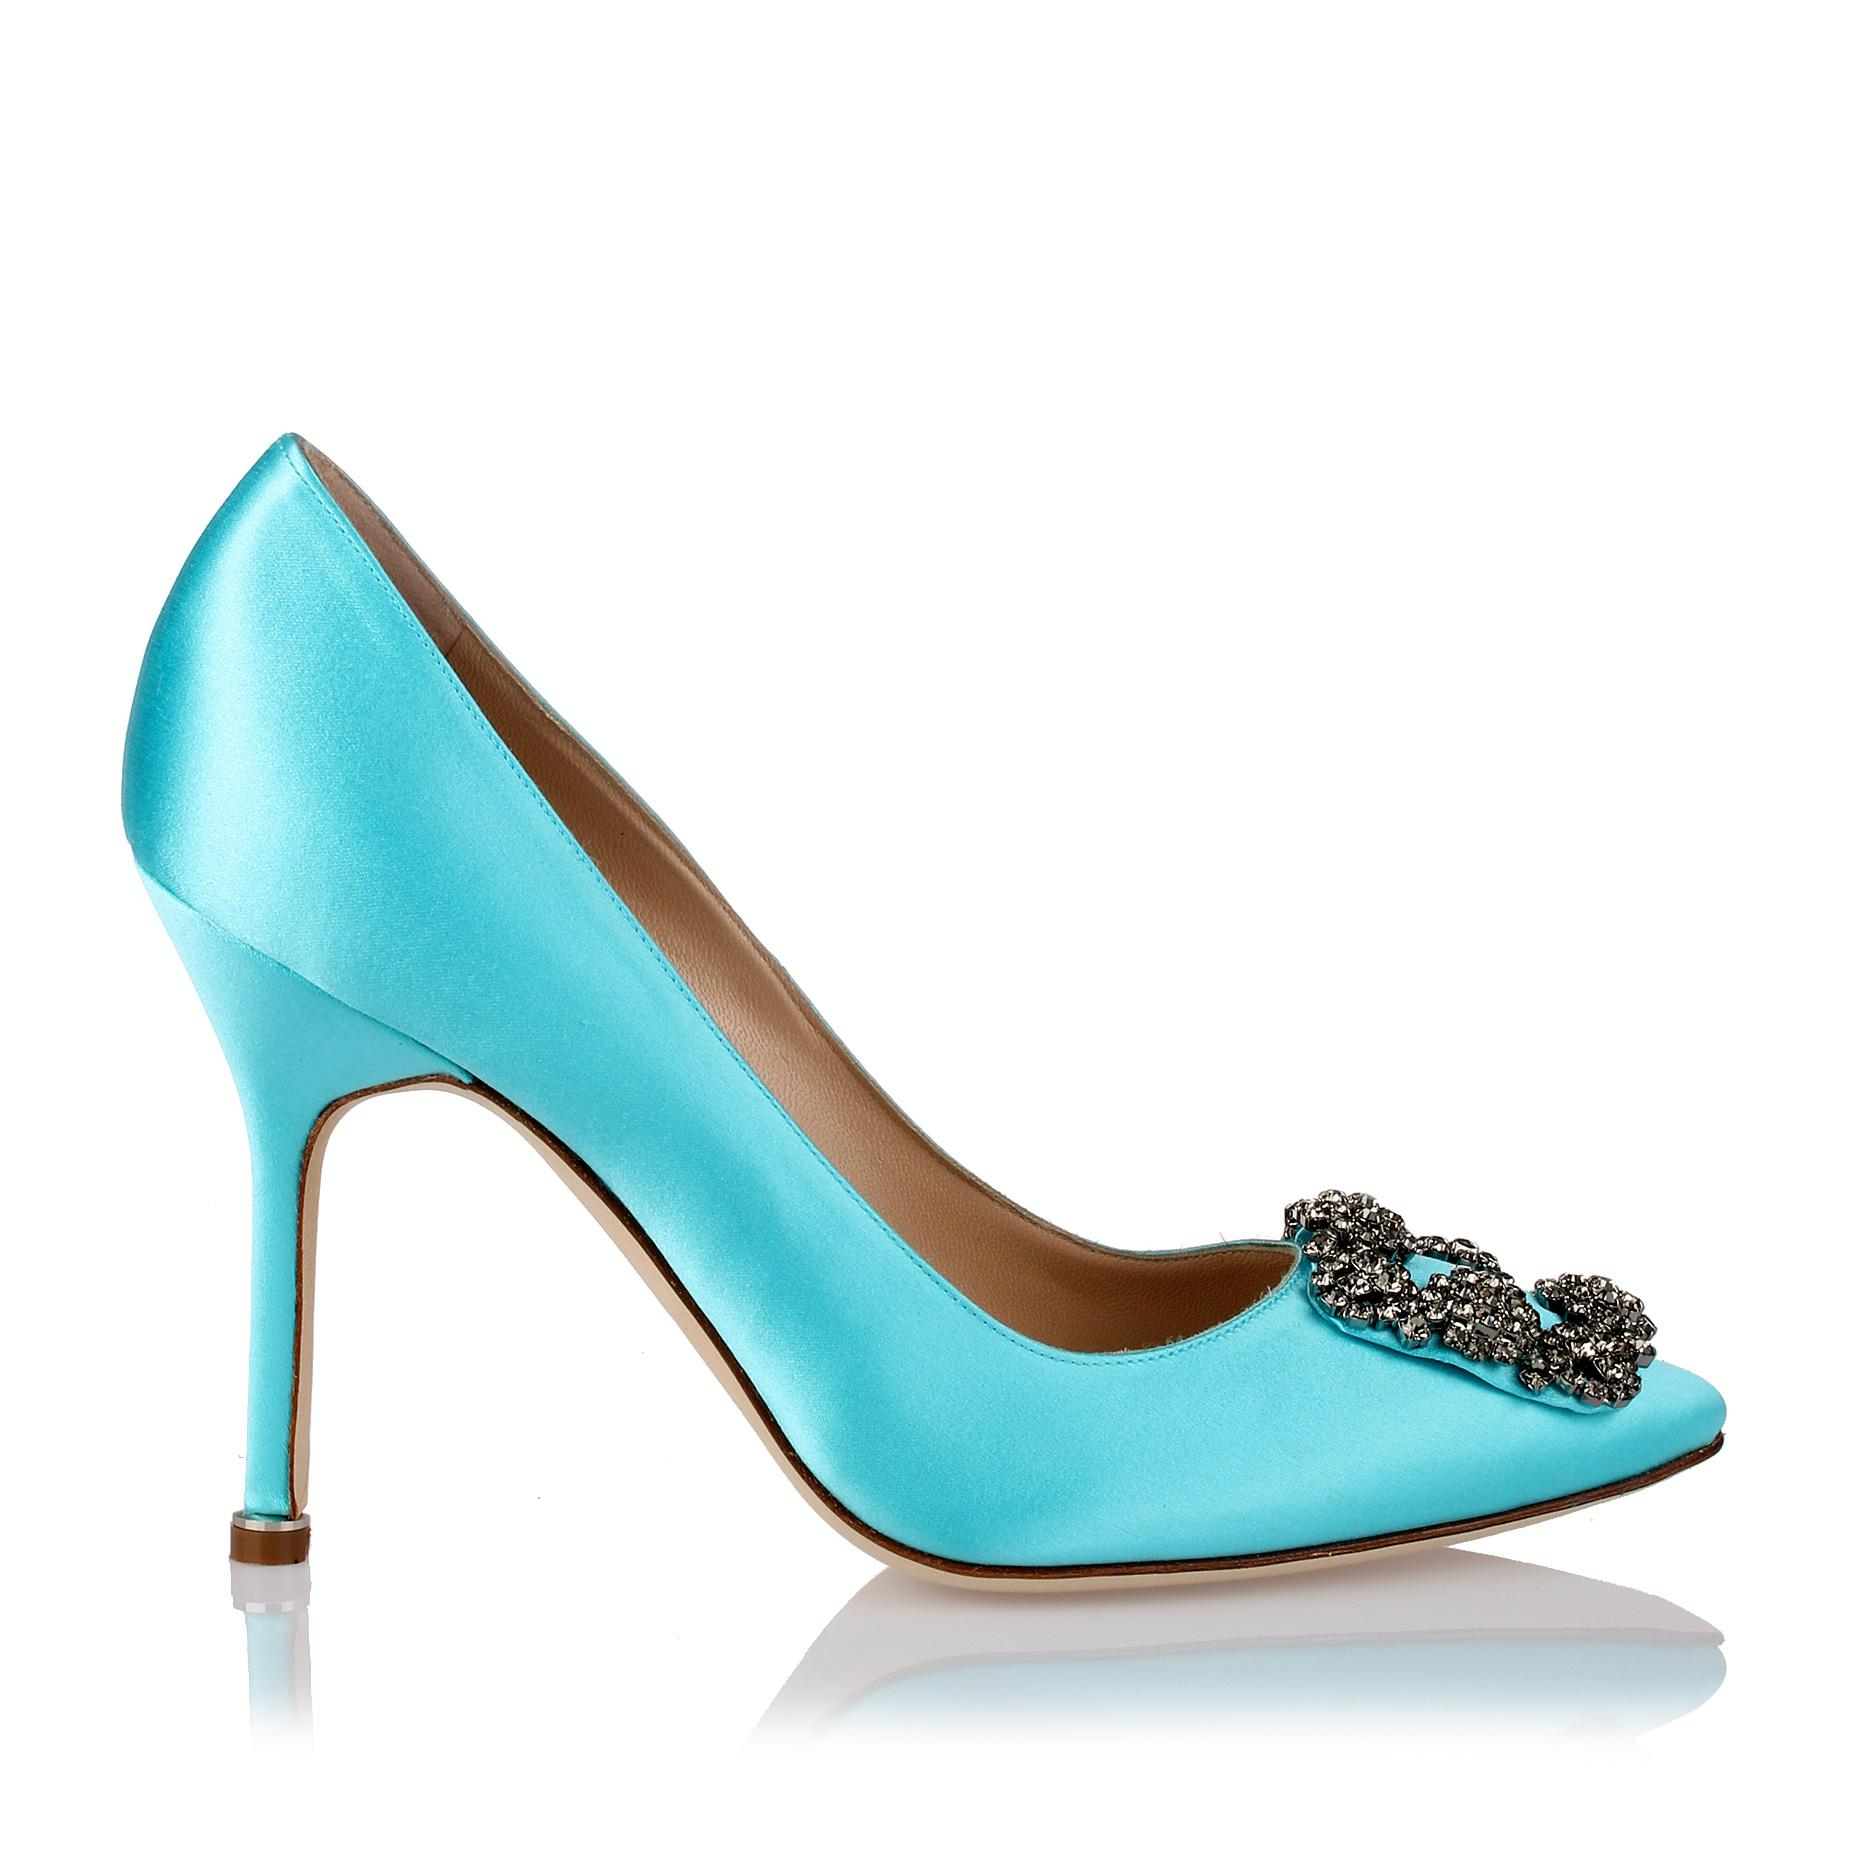 Hangisi 105 turquoise blue satin pump Manolo Blahnik uYdnC